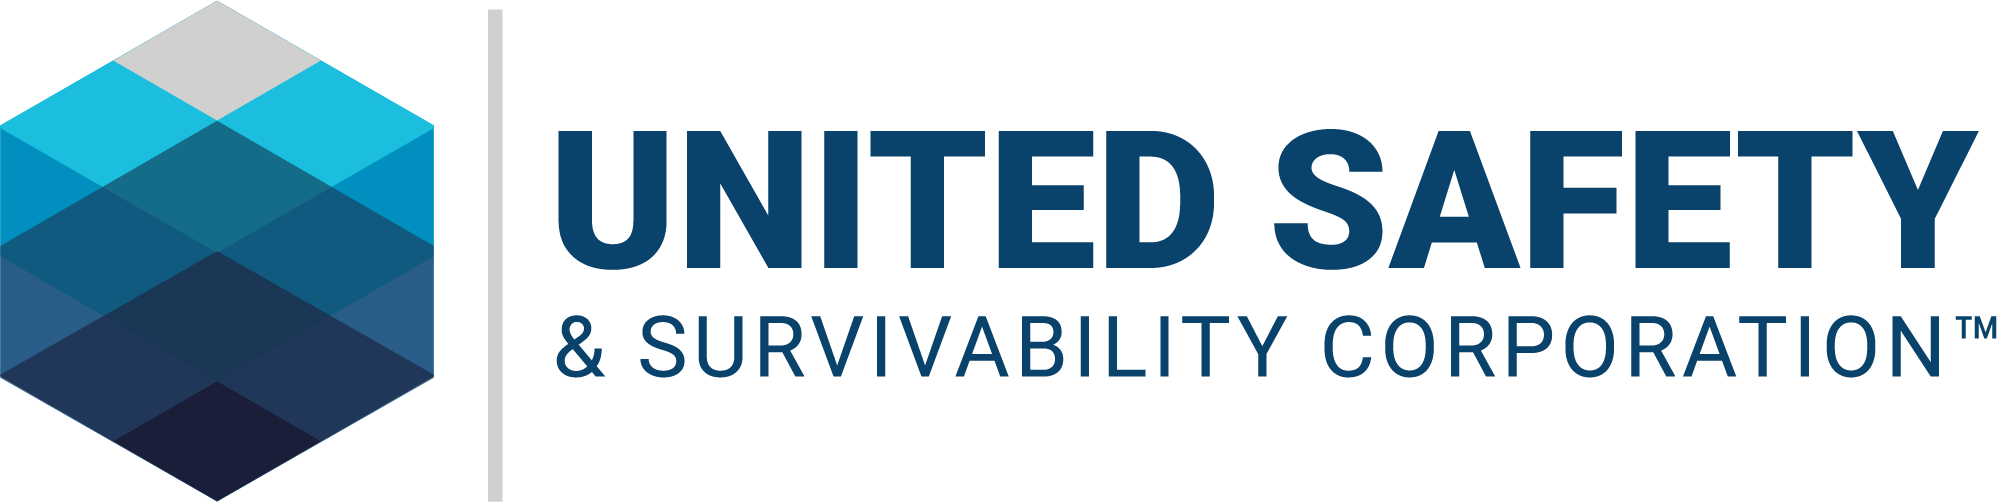 United Safety & Survivability Corporation